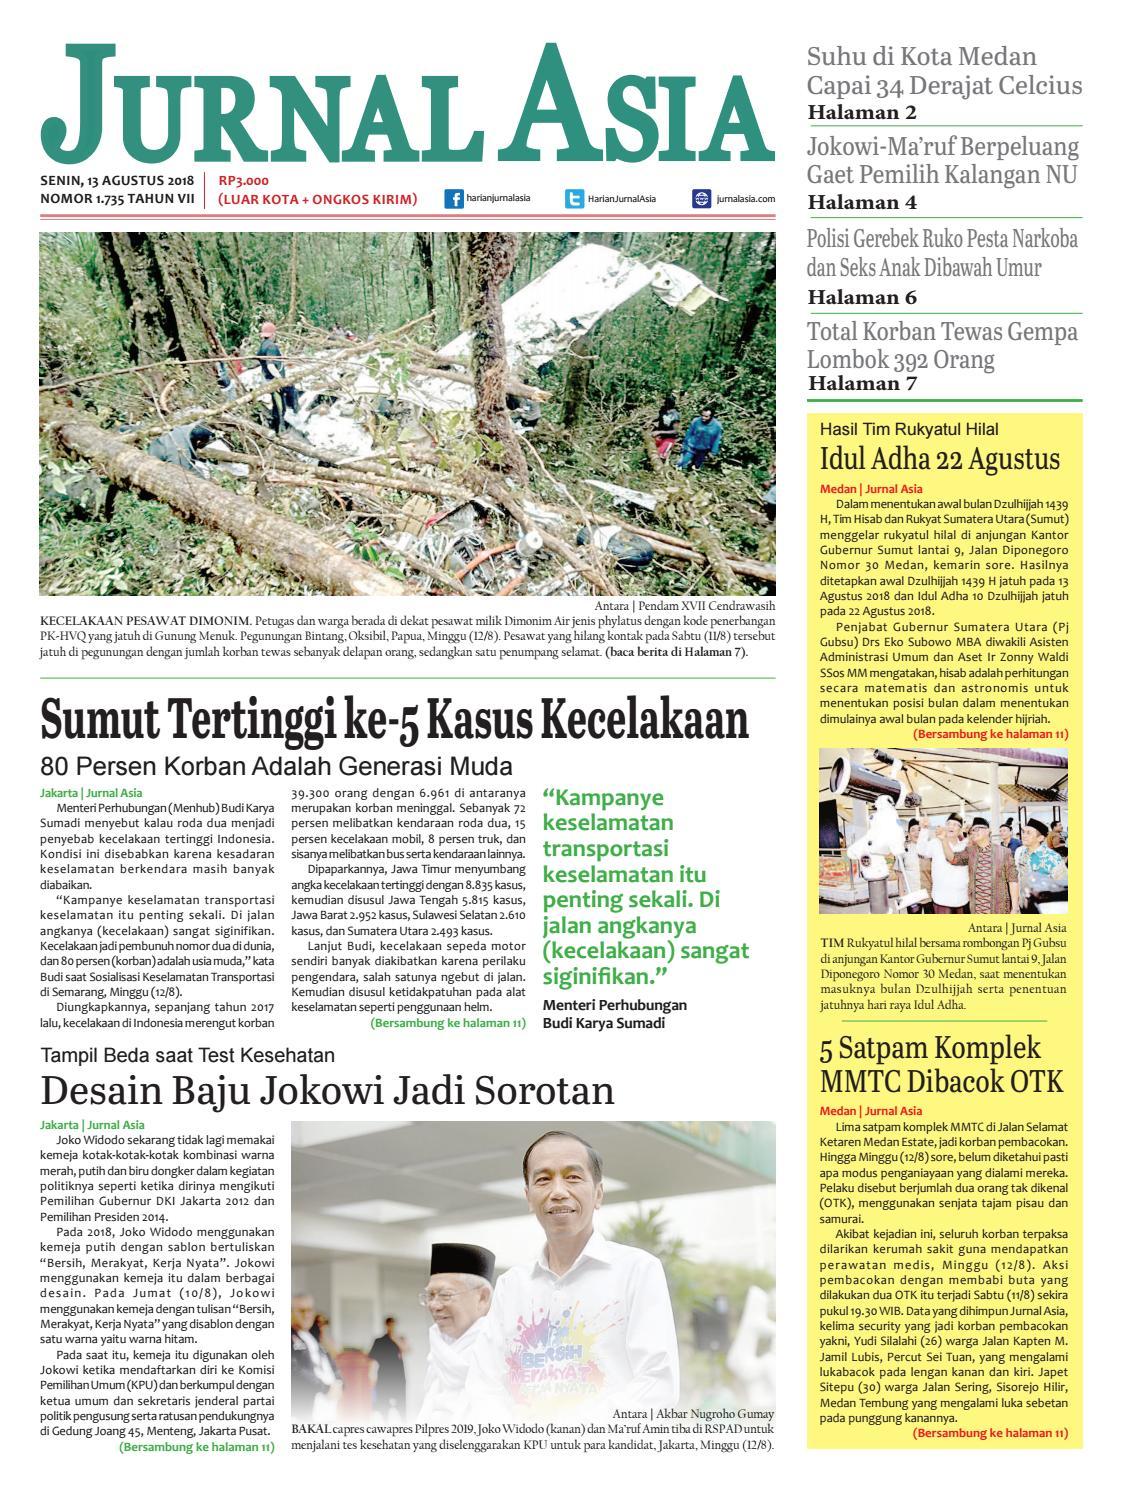 Harian Jurnal Asia Edisi Senin 13 Agustus 2018 By Harian